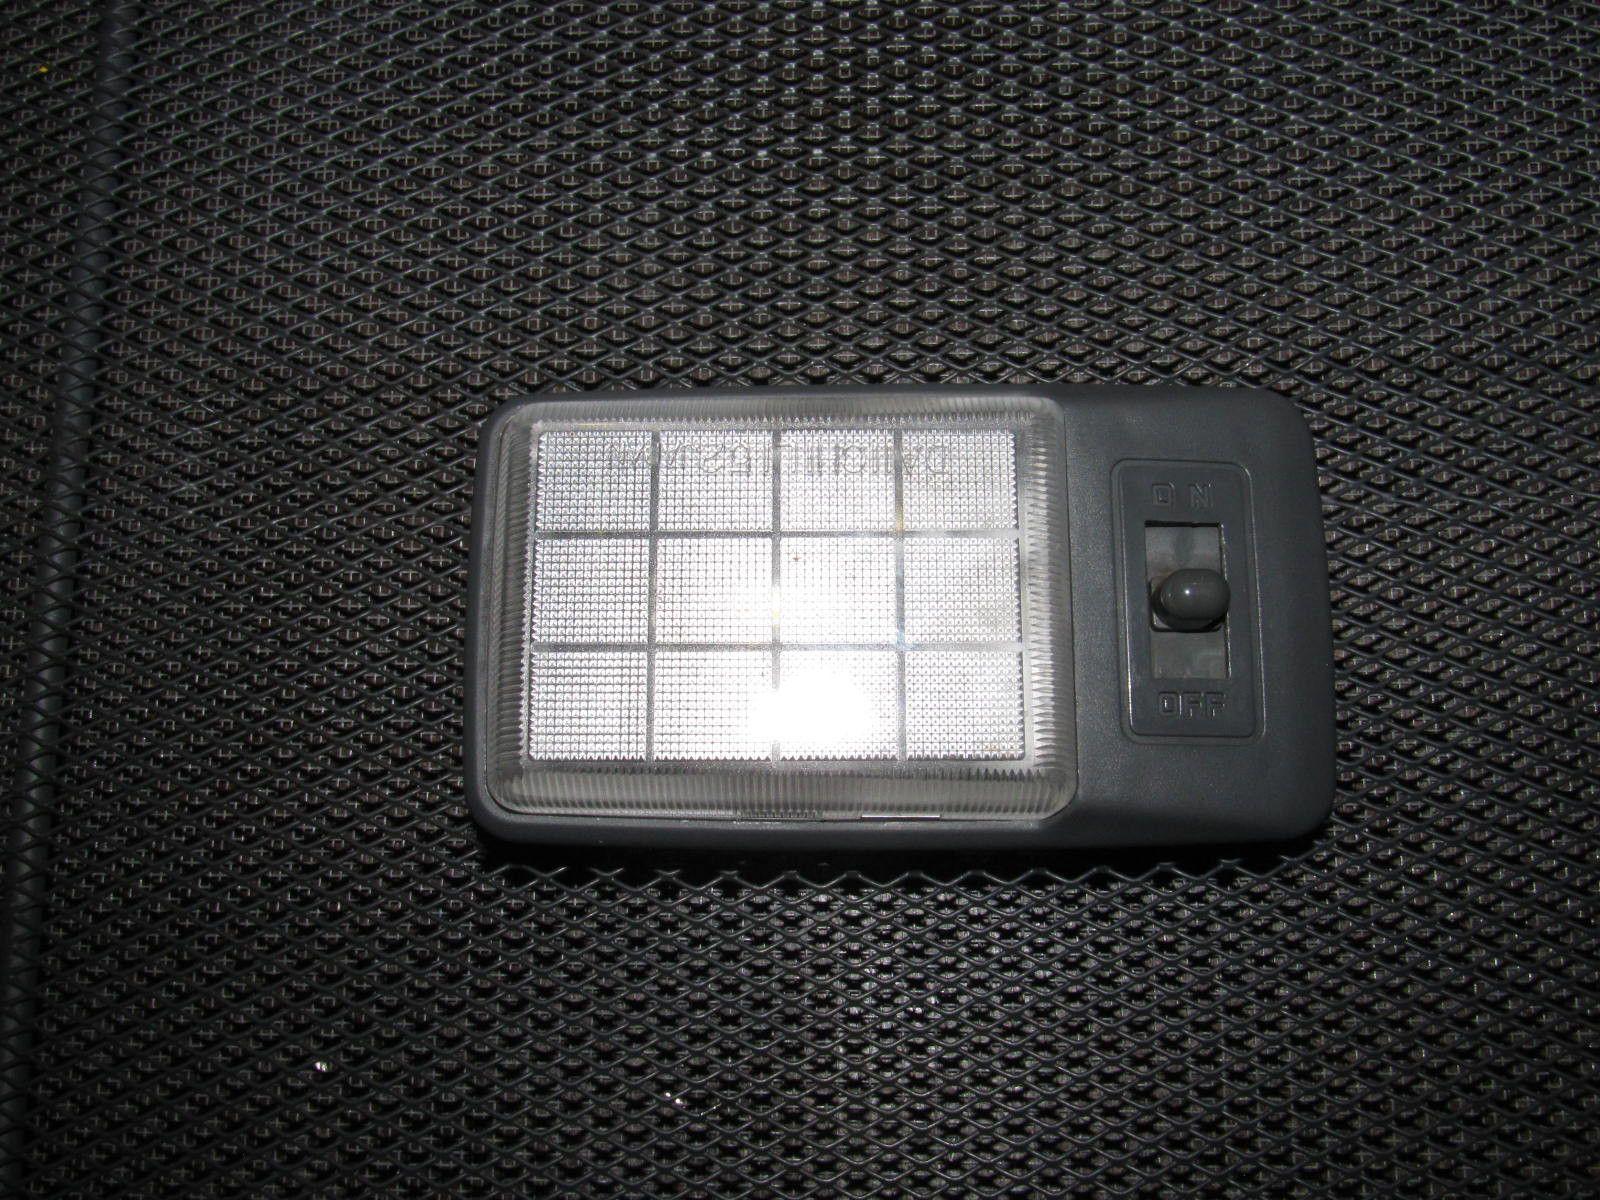 93 94 95 96 97 Honda Del Sol Oem Interior Fuse Box Cover Wiring Autopartone Wiring93